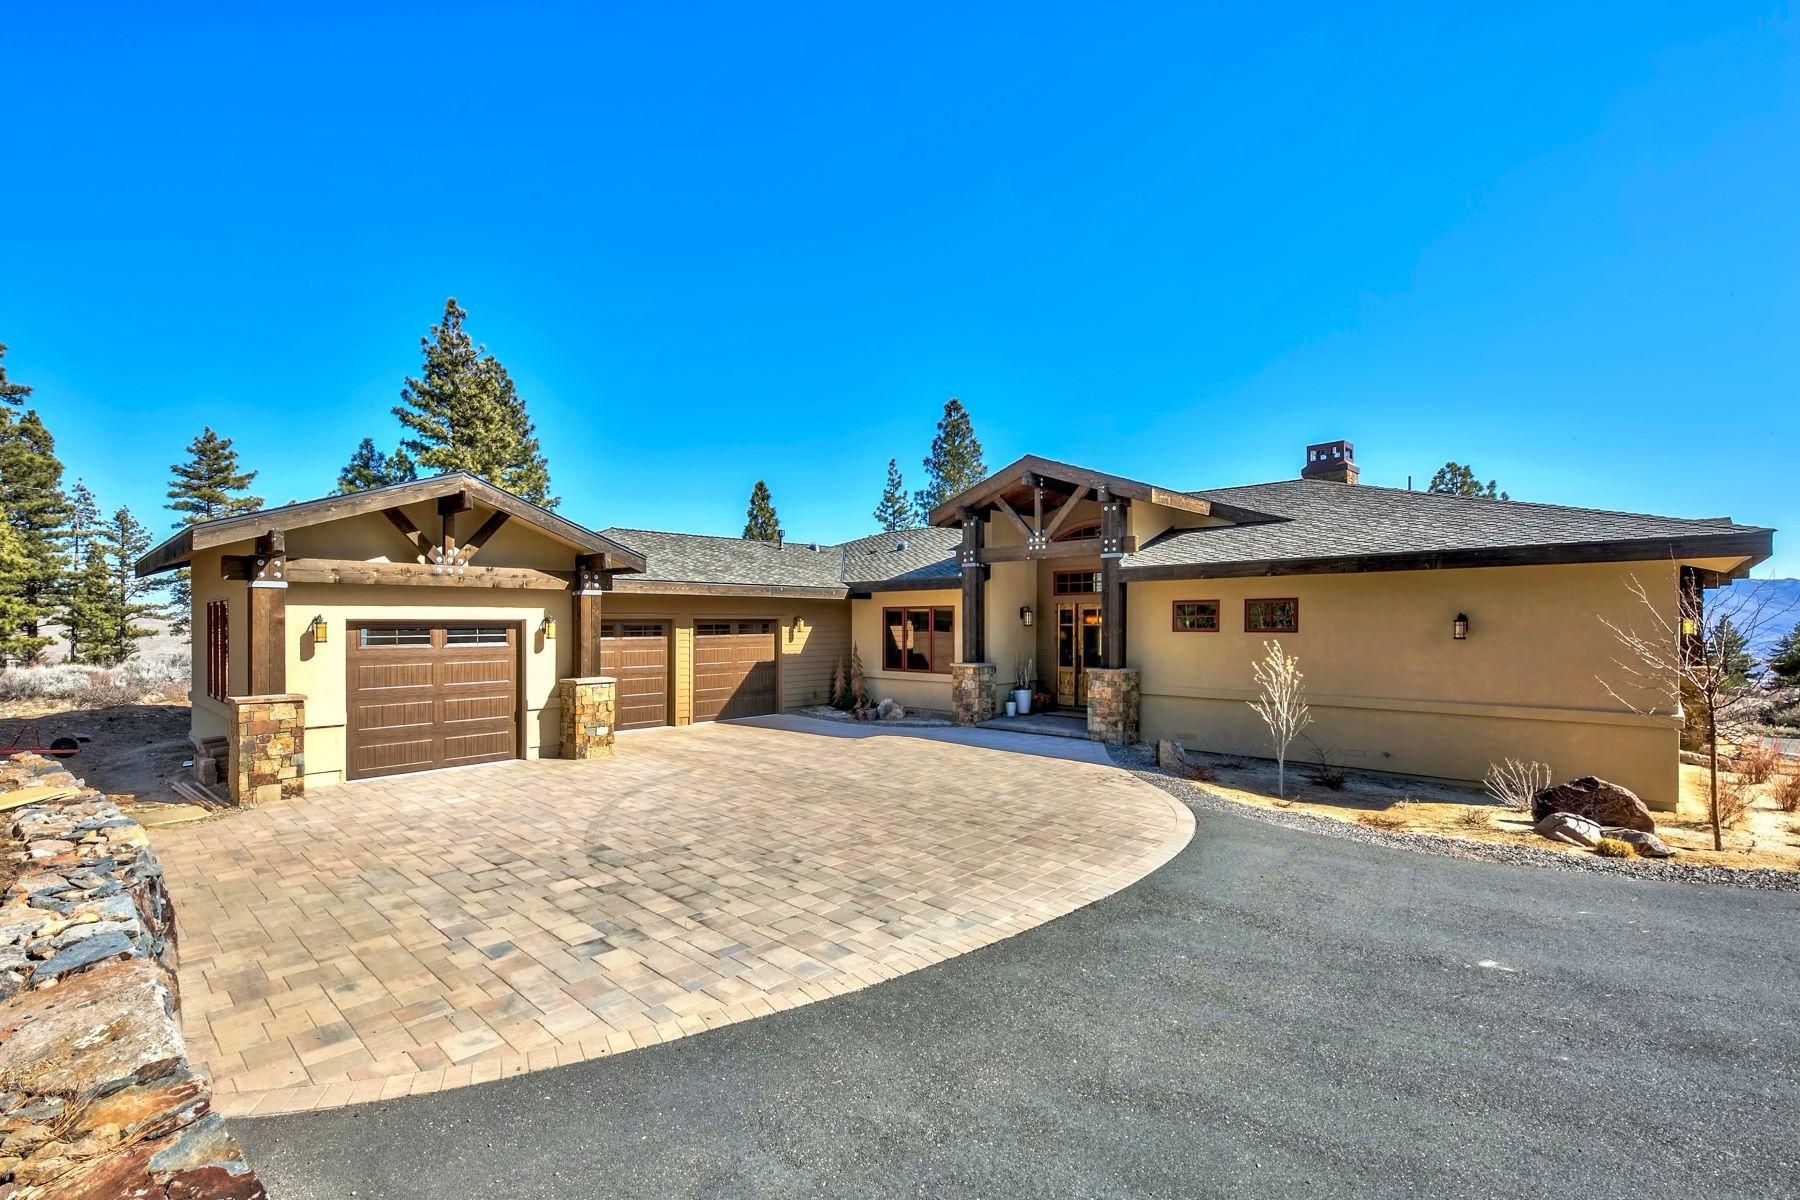 Additional photo for property listing at 645 Sand Cherry Ct, Reno 89511 645 Sand Cherry Court Reno, Nevada 89511 Estados Unidos